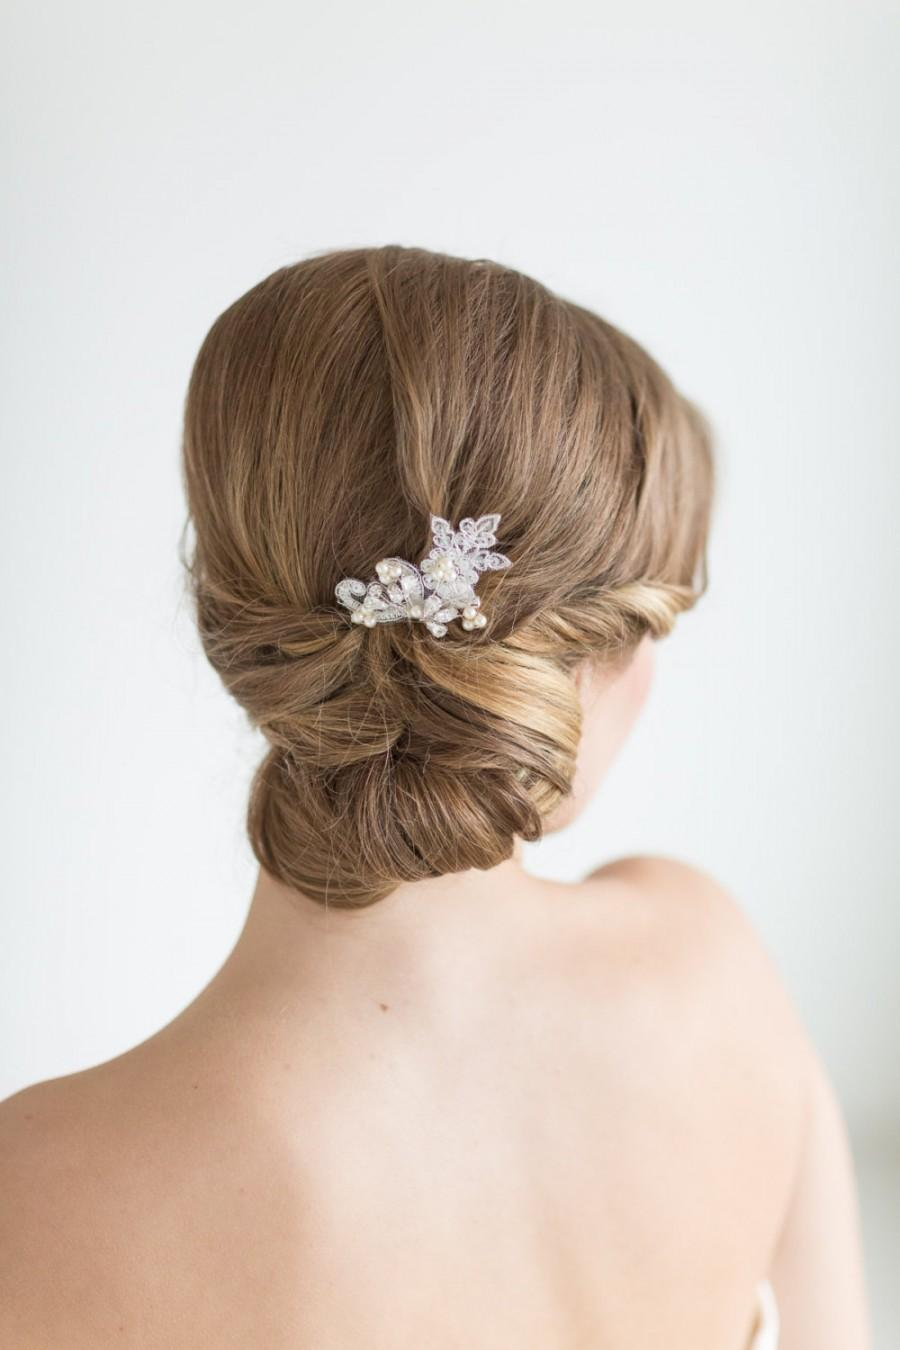 Düğün - Wedding Hair Pin, Bridal Hair Pin, Swarovski Pearl Wedding Hair Pin